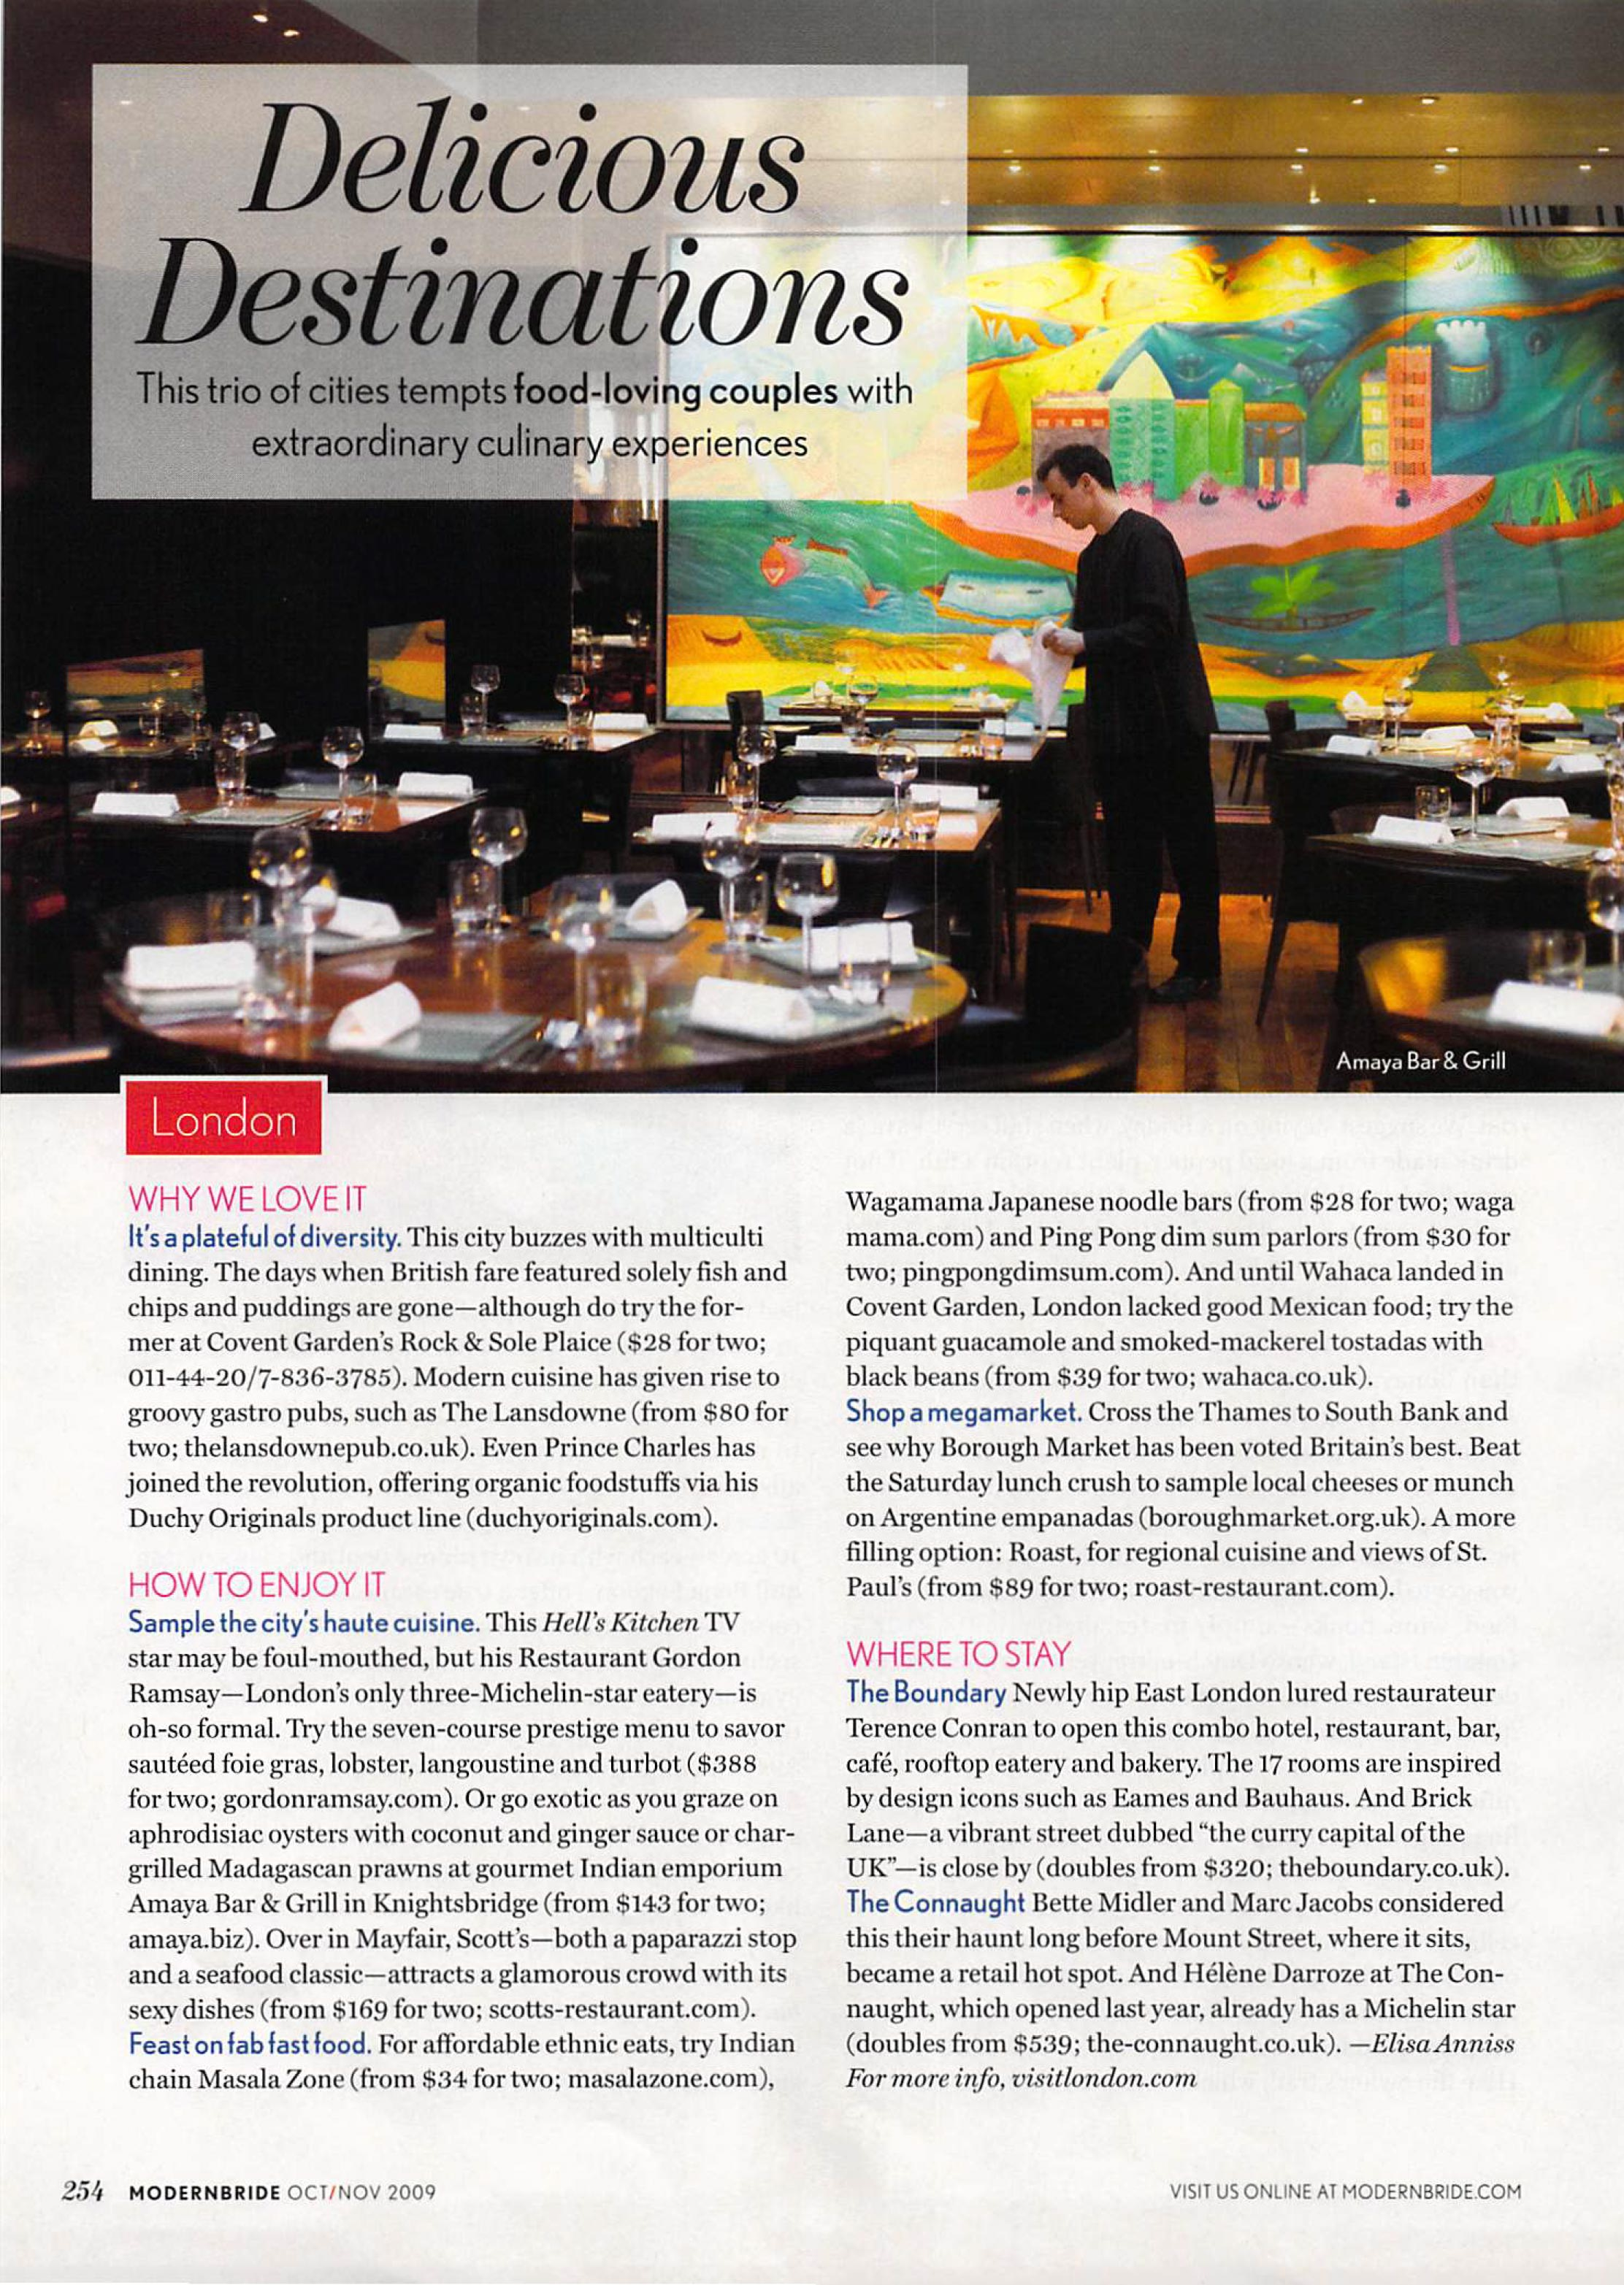 ModernBride---London-foodies-feature.jpg